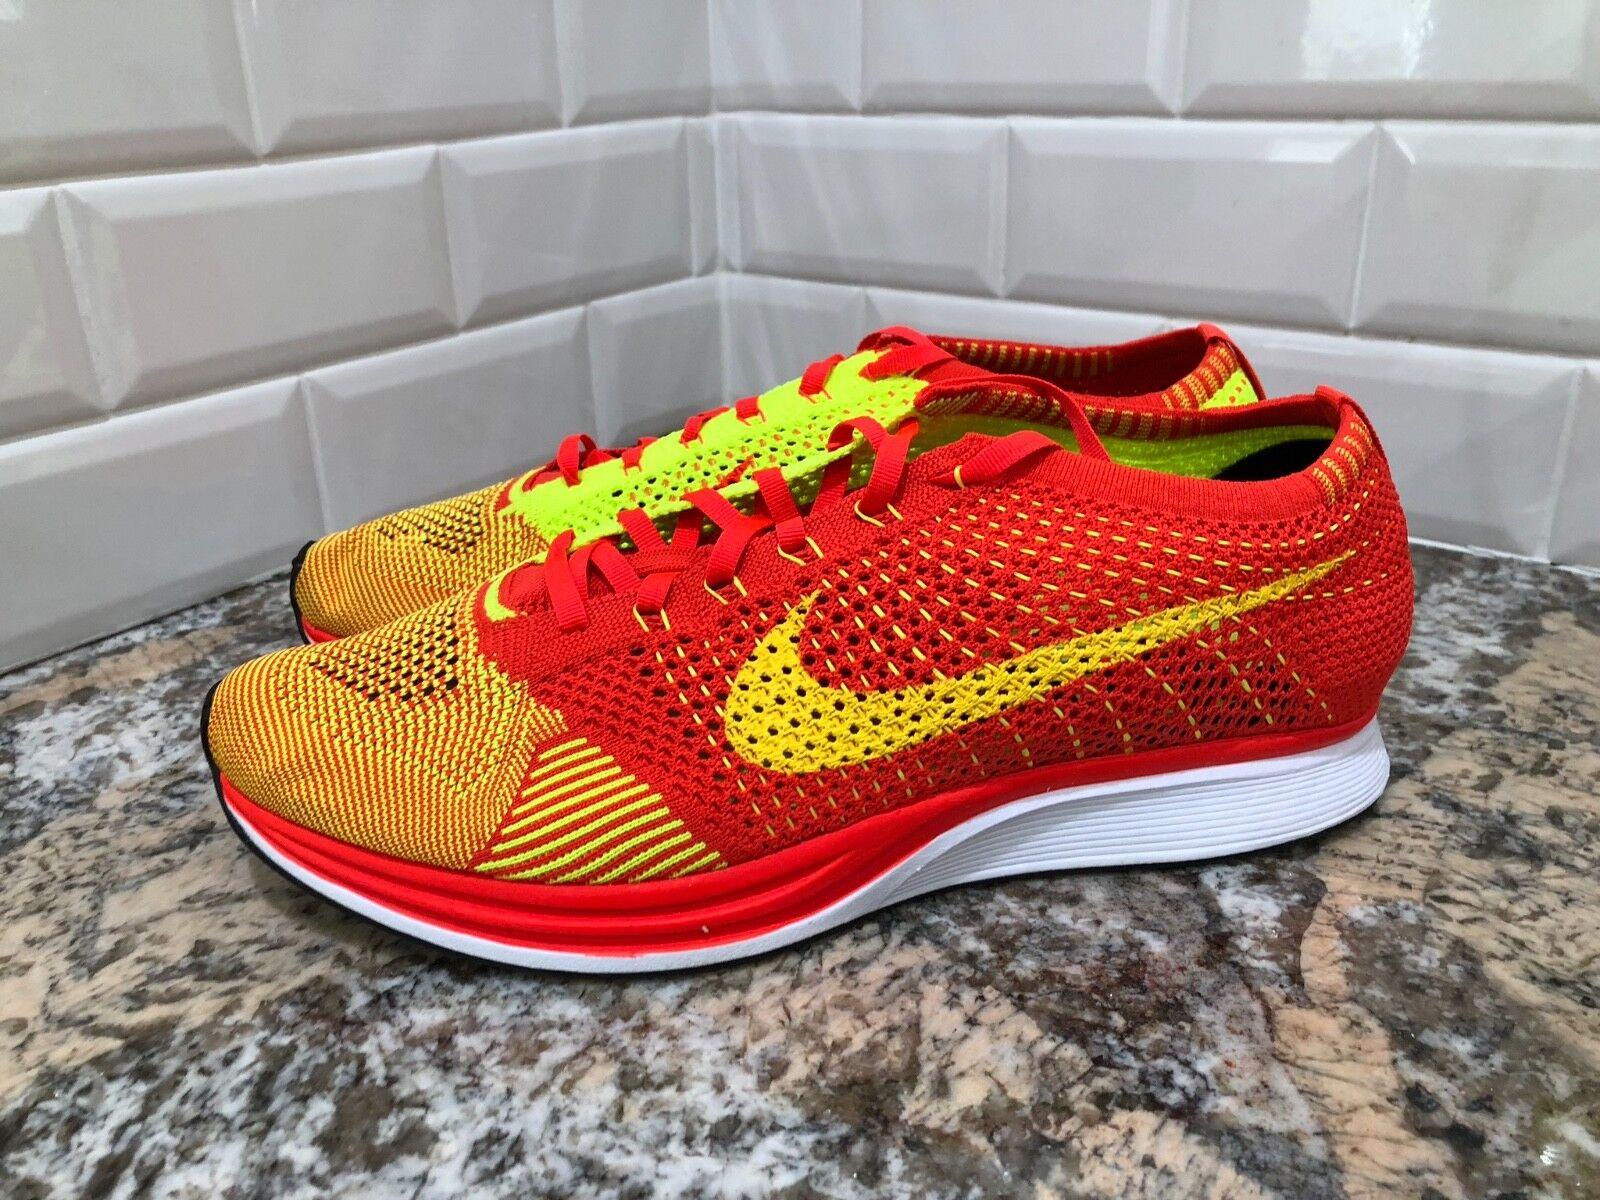 2018 Nike Flyknit -601 Racer Bright Crimson/Volt tamaño Trainer 526628 -601 Flyknit SZ 13 81f203